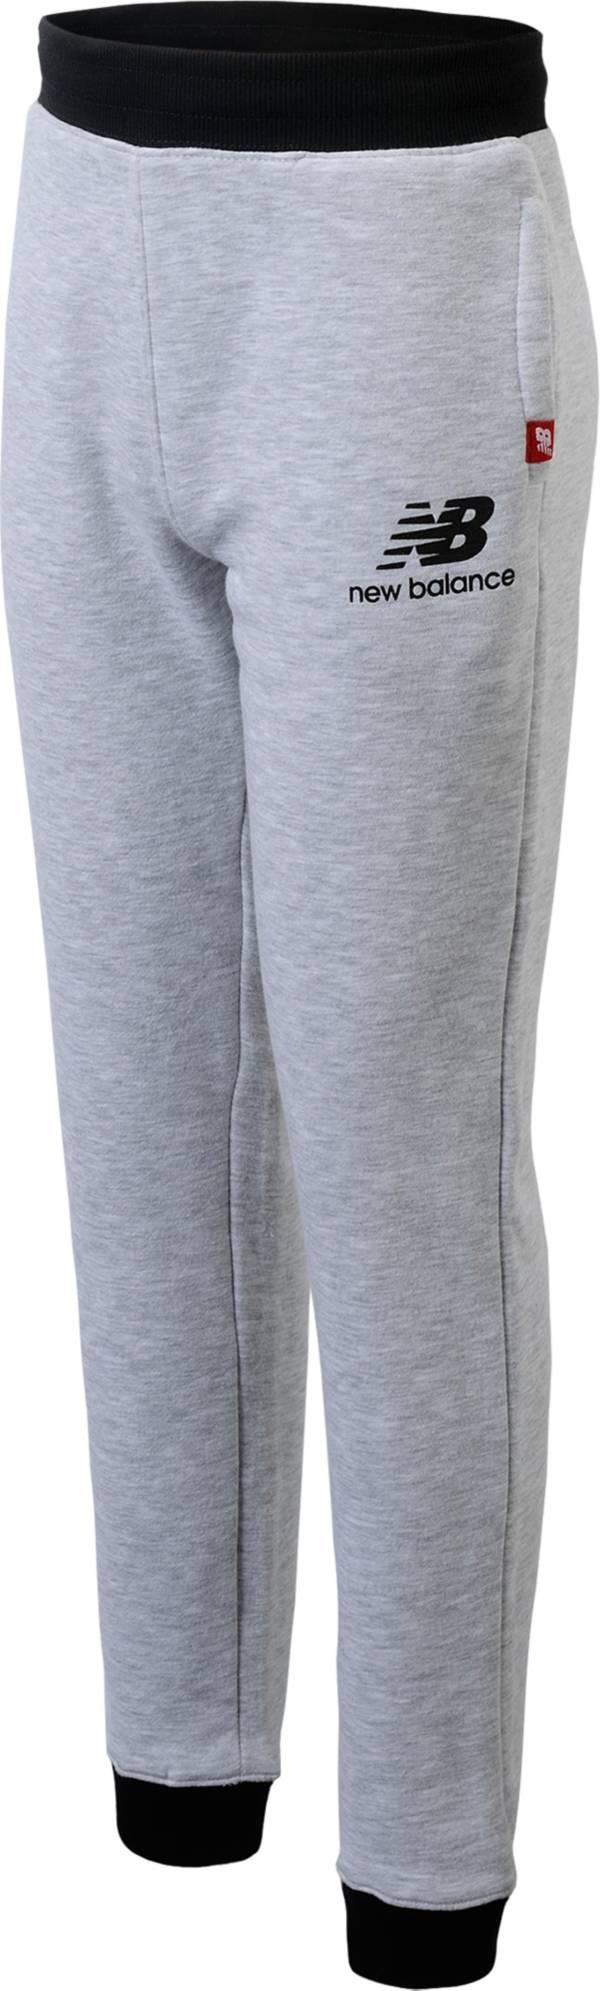 New Balance Little Boys' Core Fleece Jogger Pants product image